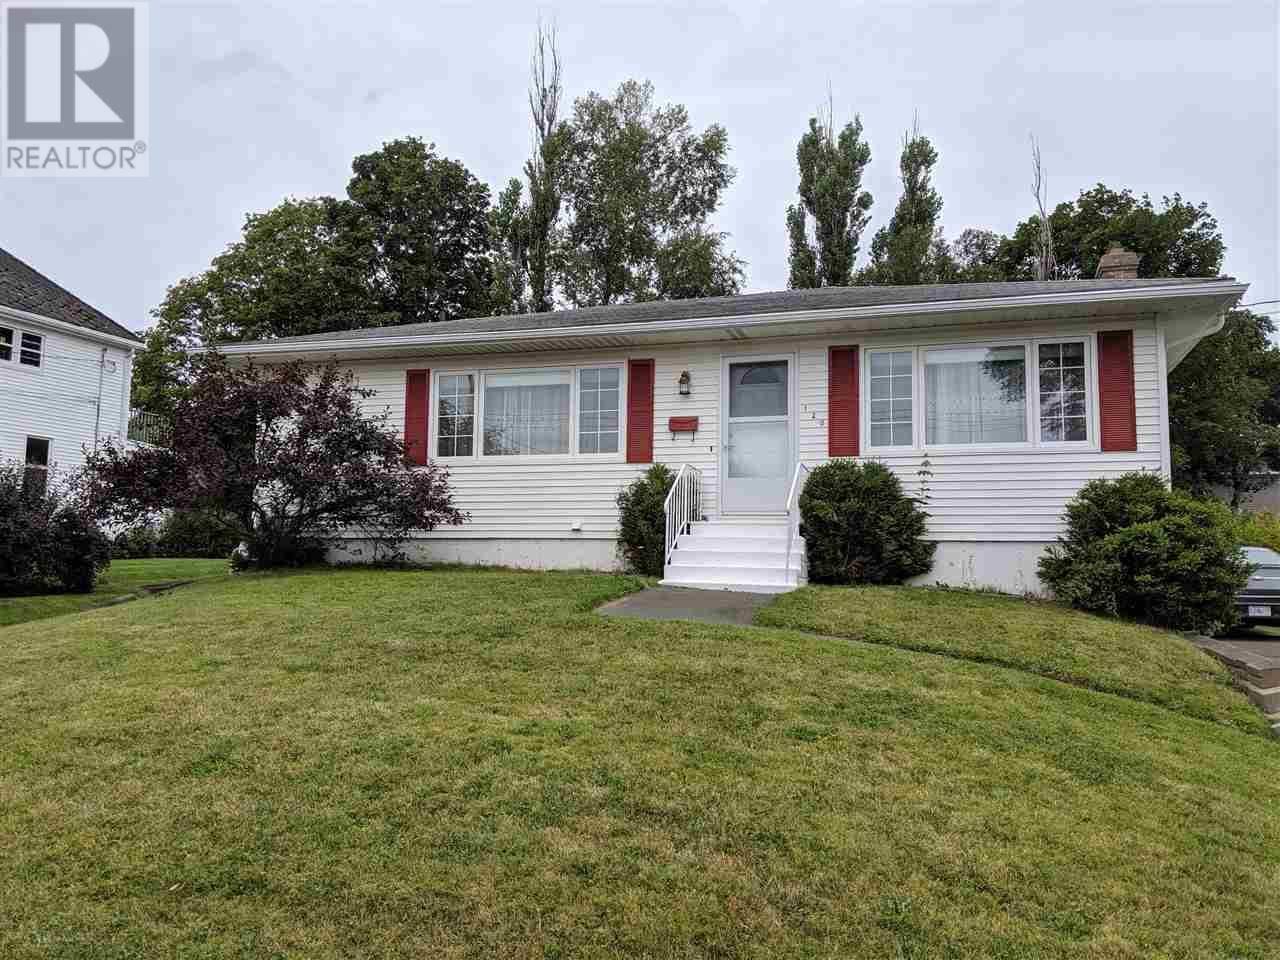 House for sale at 120 Herbert St New Glasgow Nova Scotia - MLS: 201920680